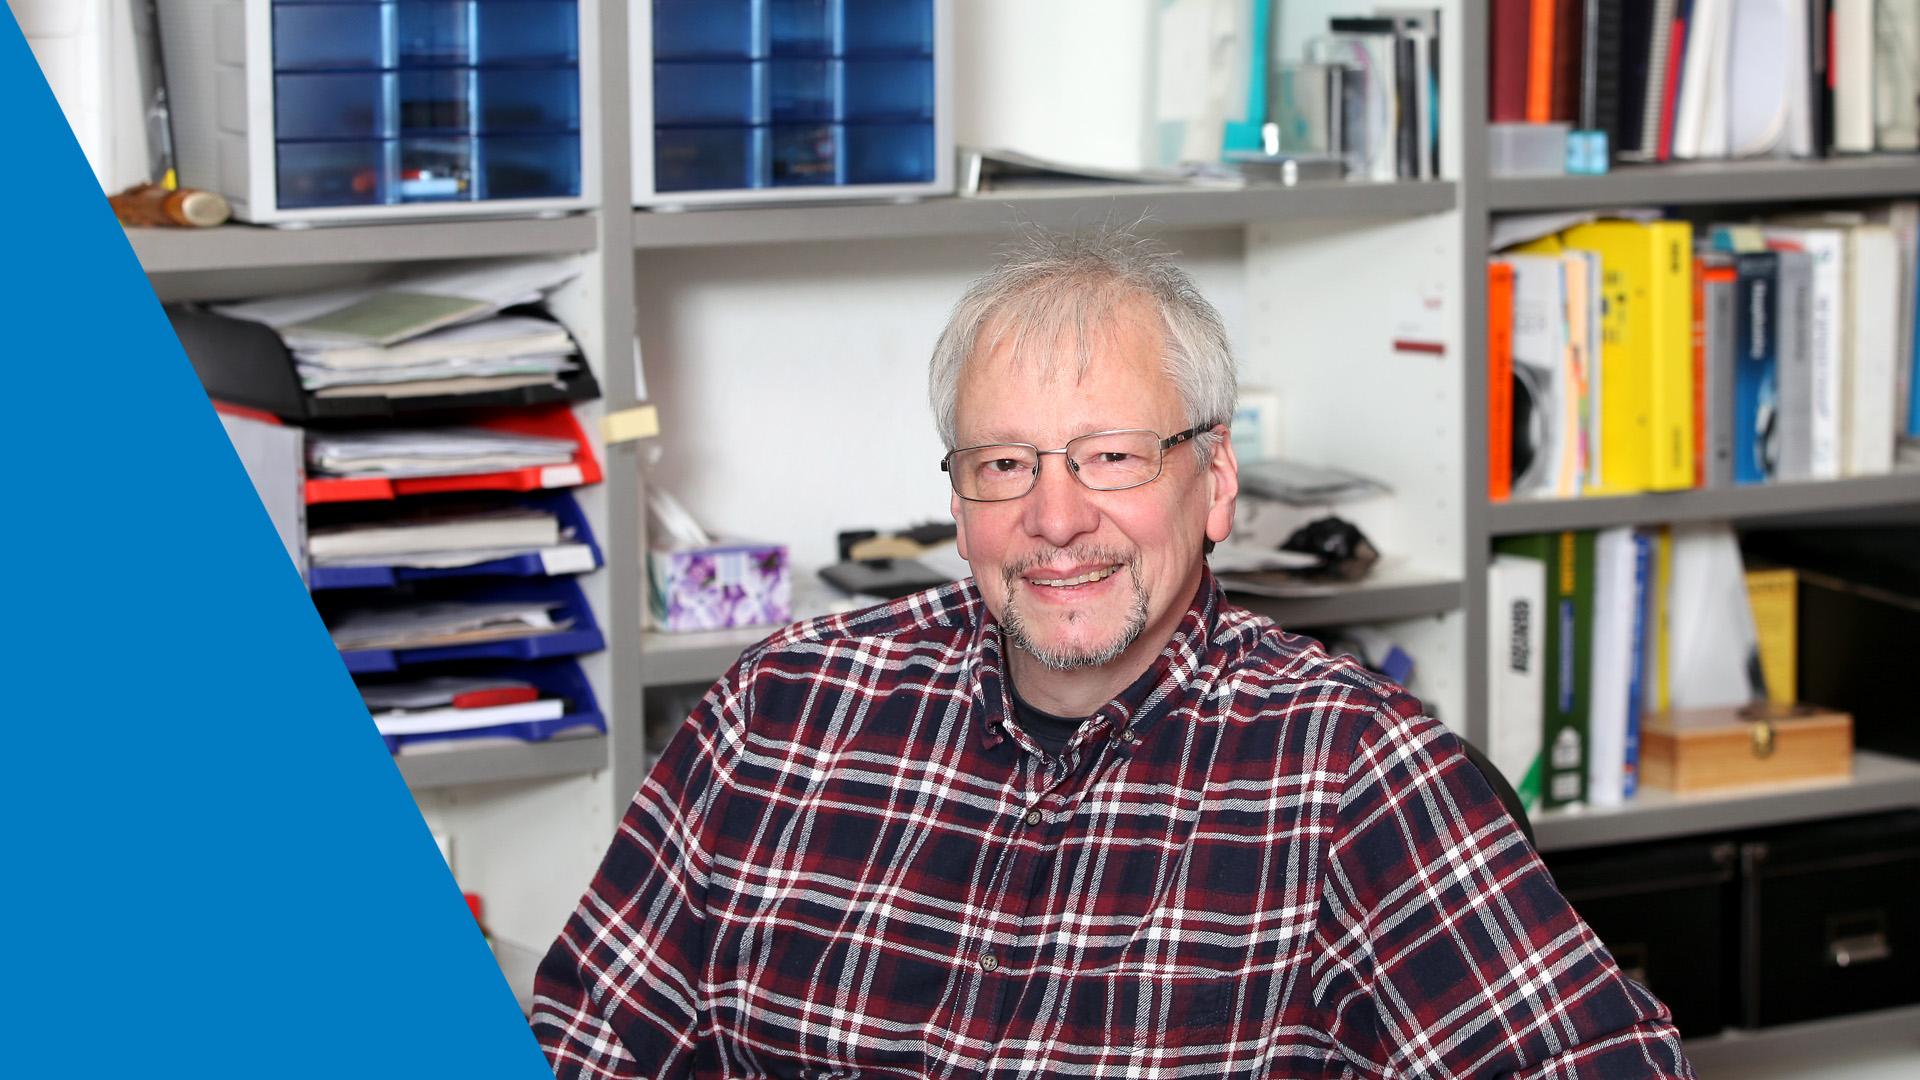 Herr Ralph Bruder, Dipl. Ing. (FH) - Geschäftsführung & Konstruktion